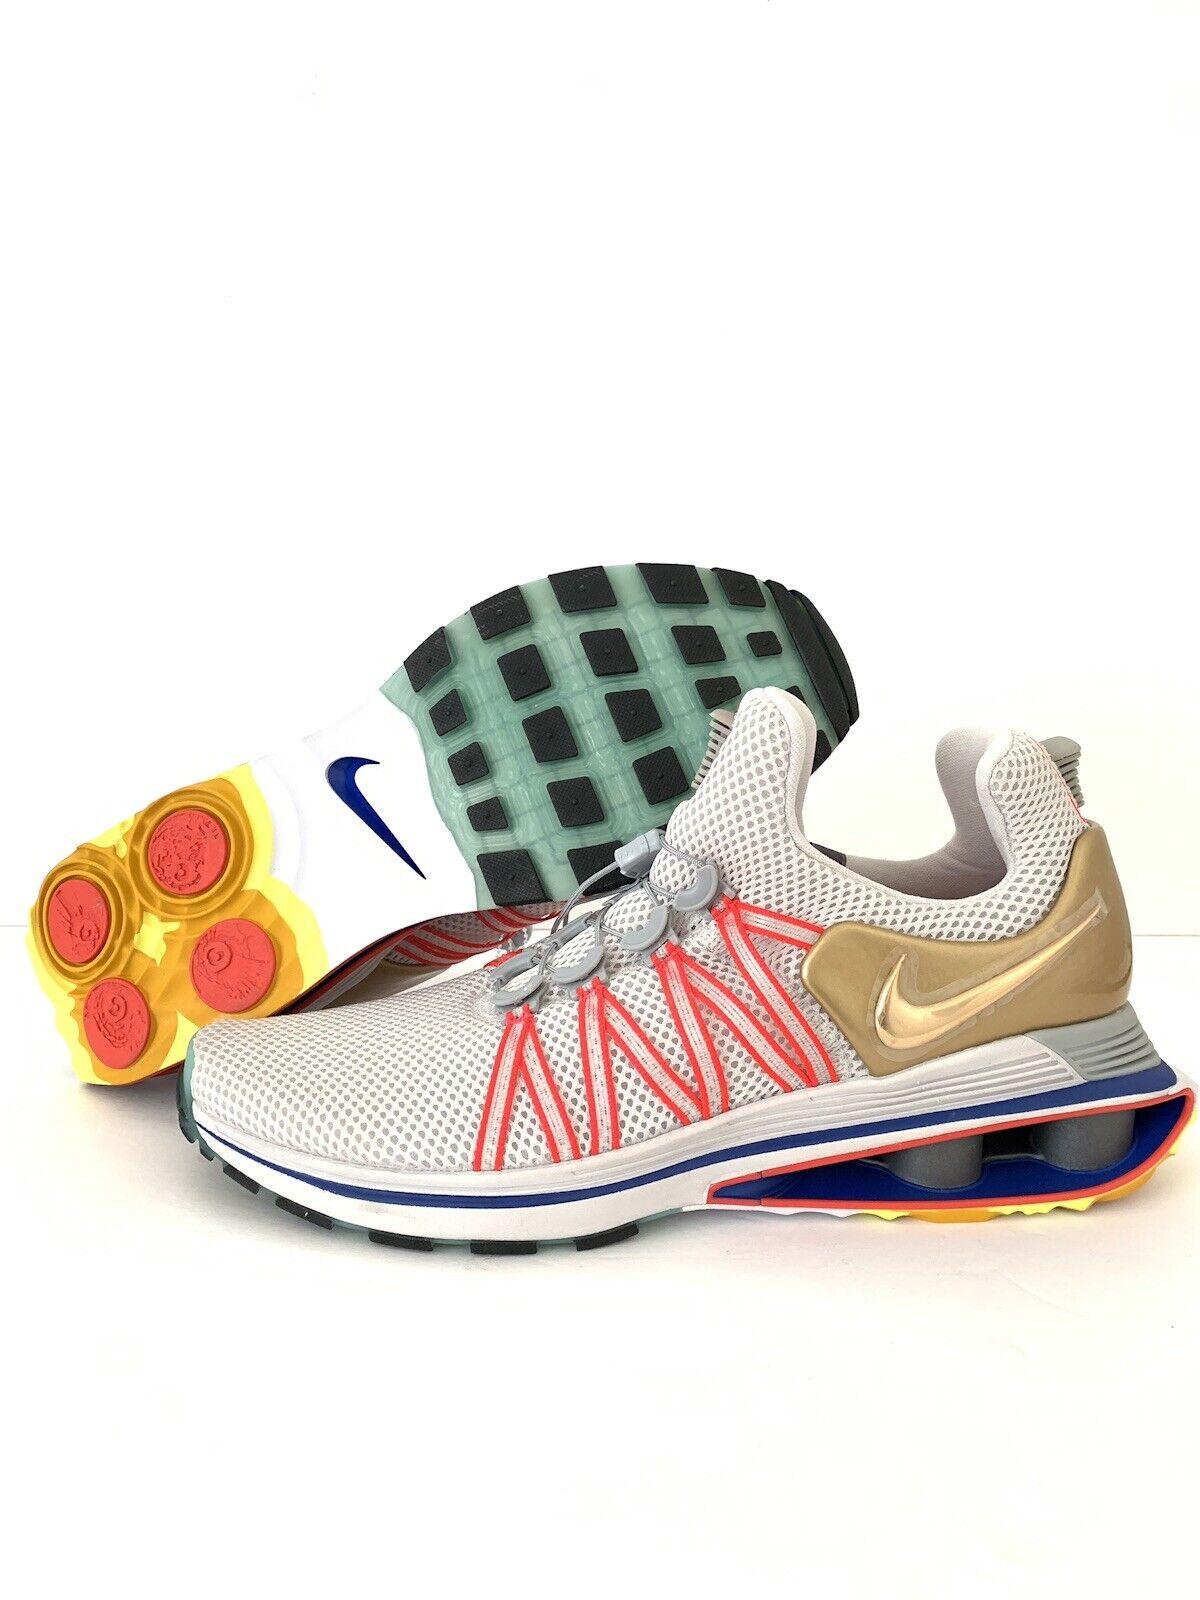 Nike Shox Gravity herr springaning skor Storlek Vast grå Metallic Metallic Metallic guld AQ8553 009  lagra på nätet